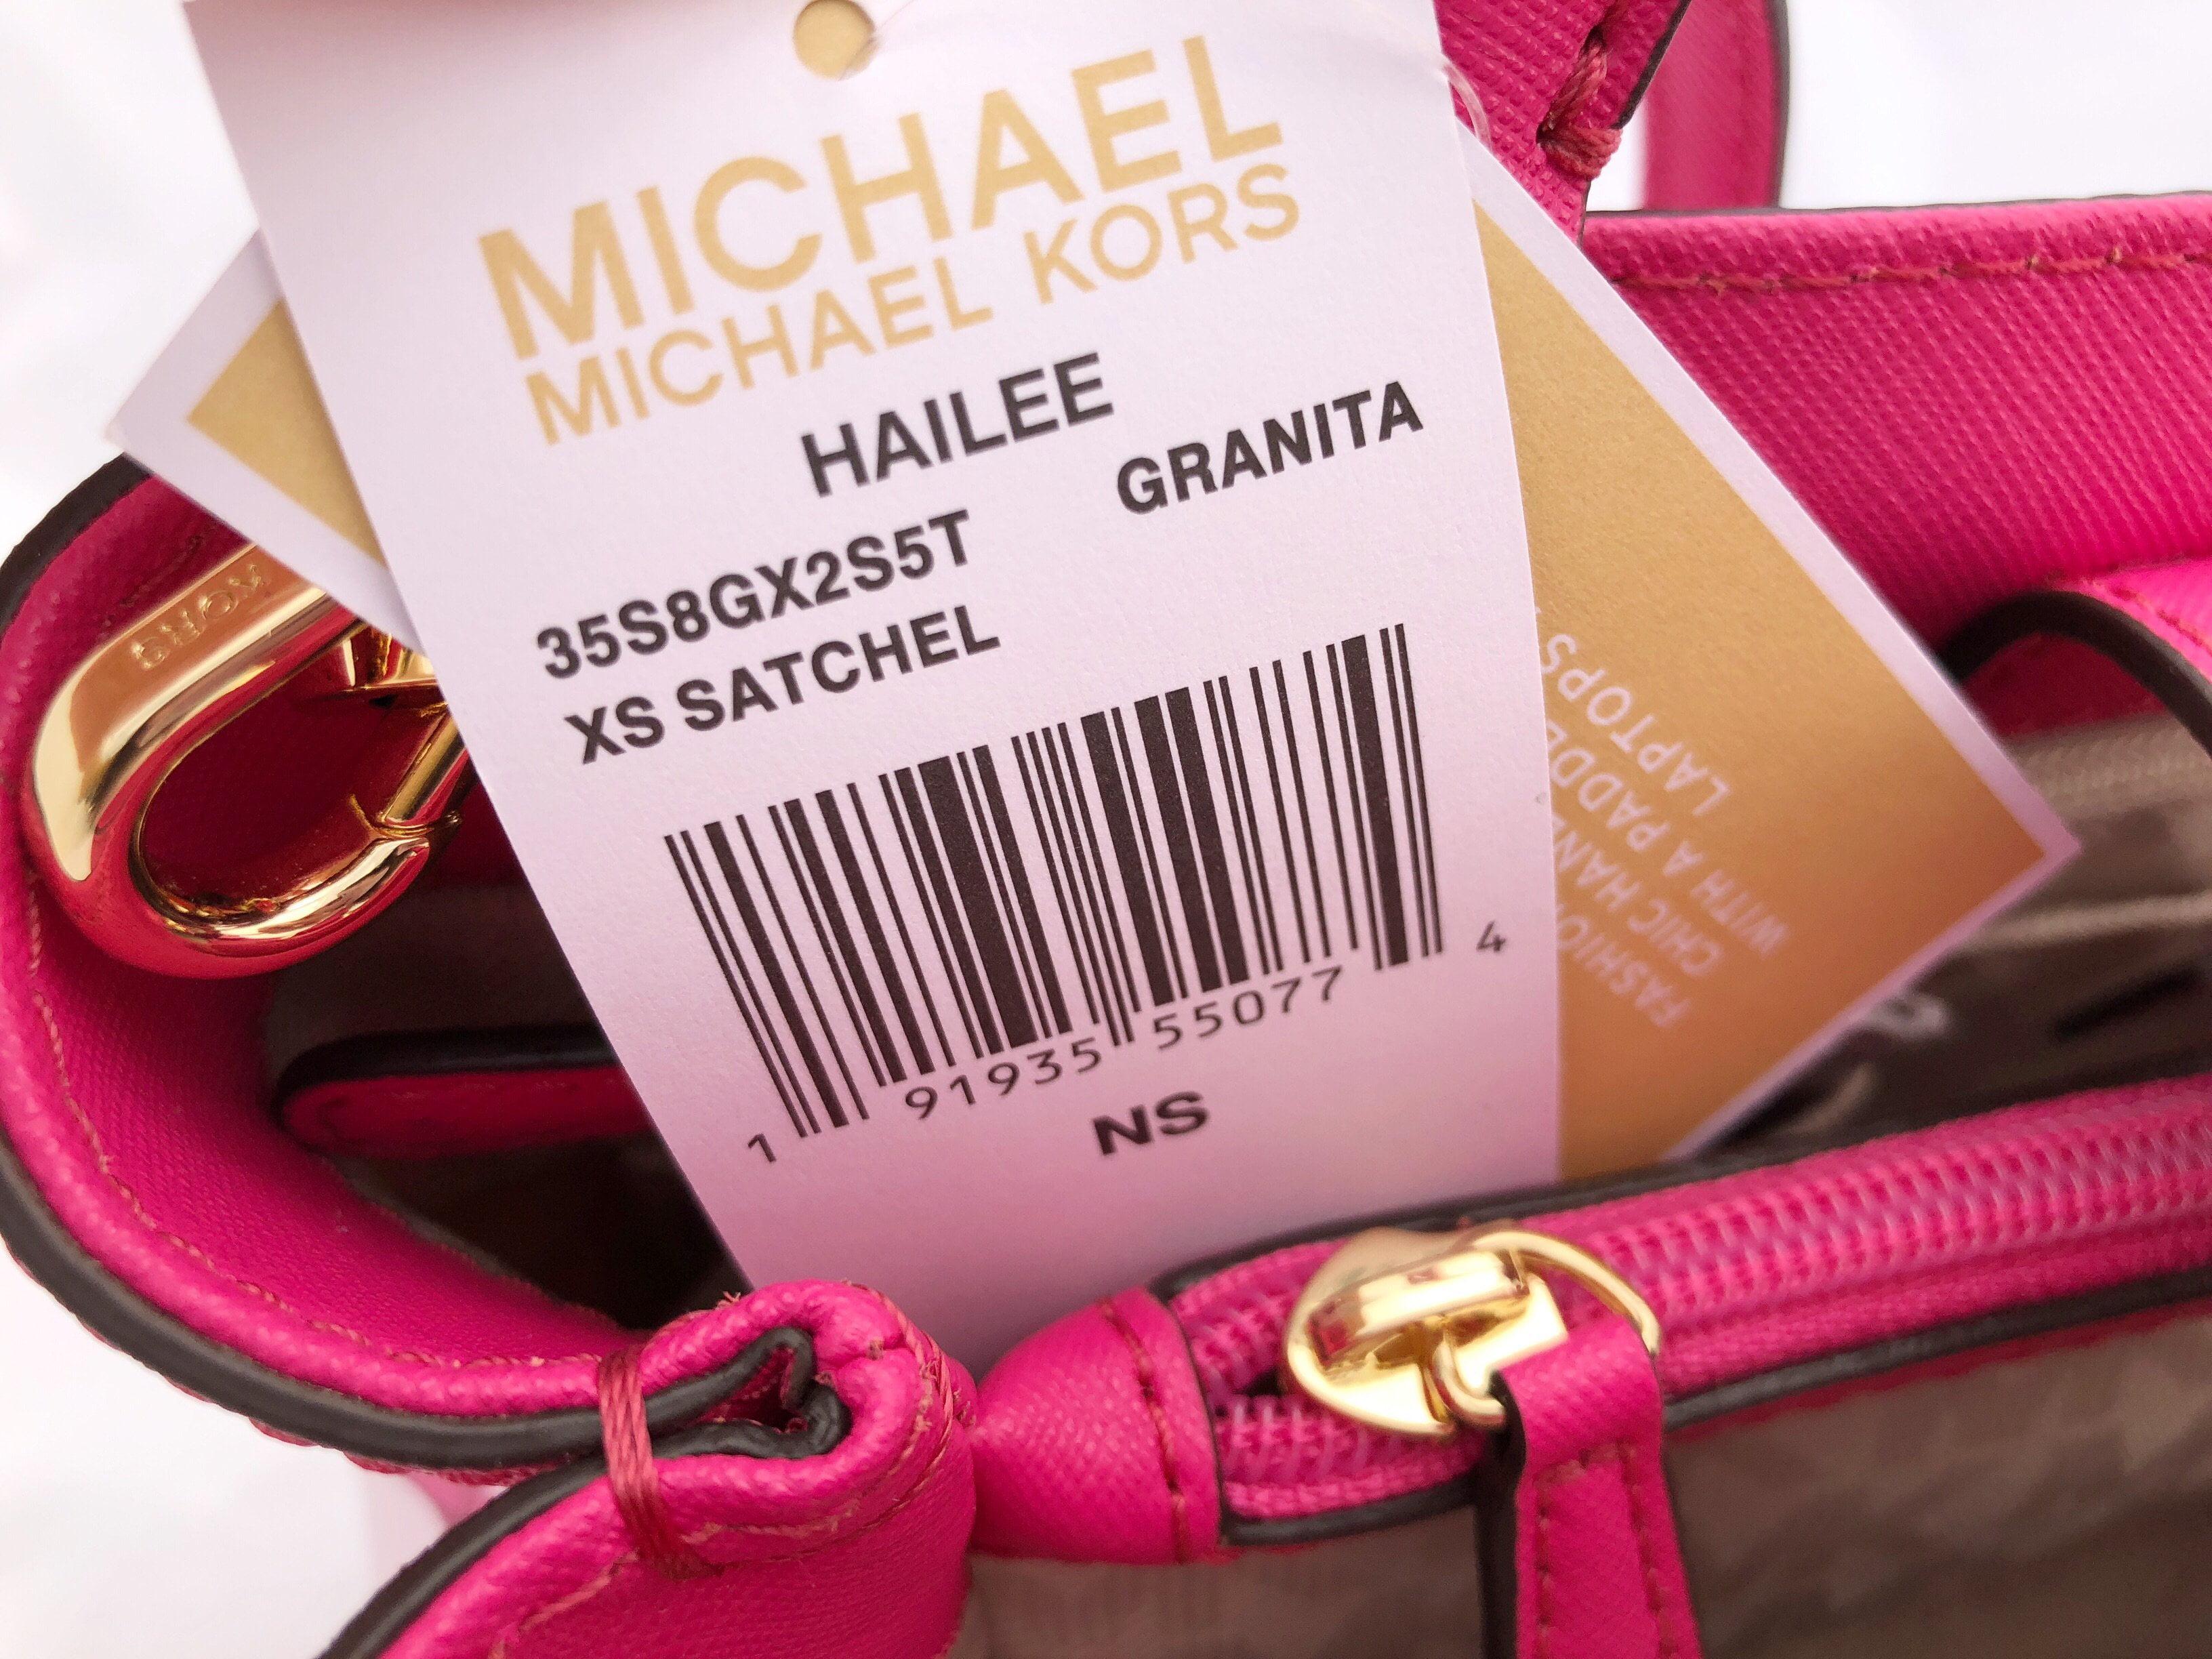 c29fb56adbbc Michael Kors - Michael Kors Hailee XS Satchel Small Crossbody Granita Pink  White Floral - Walmart.com